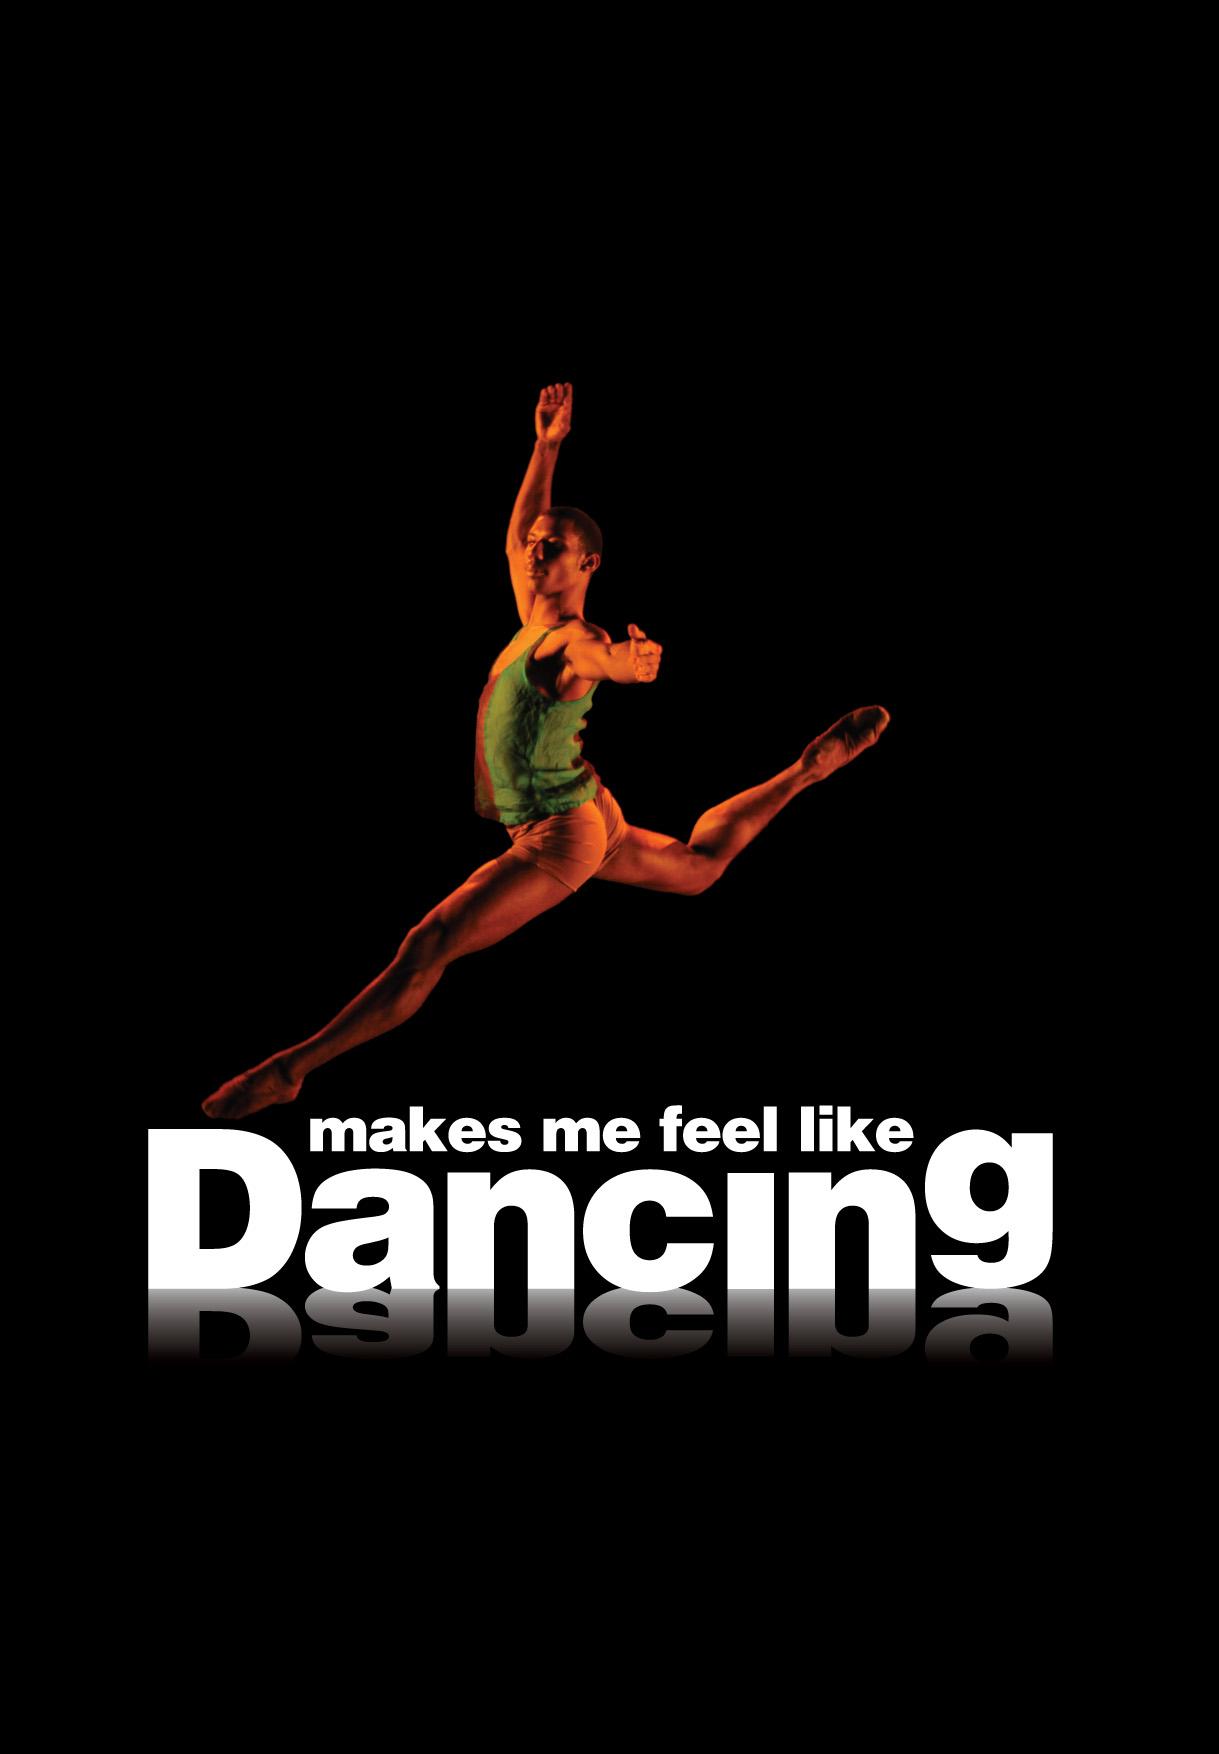 'Makes me Feel Like Dancing' logo